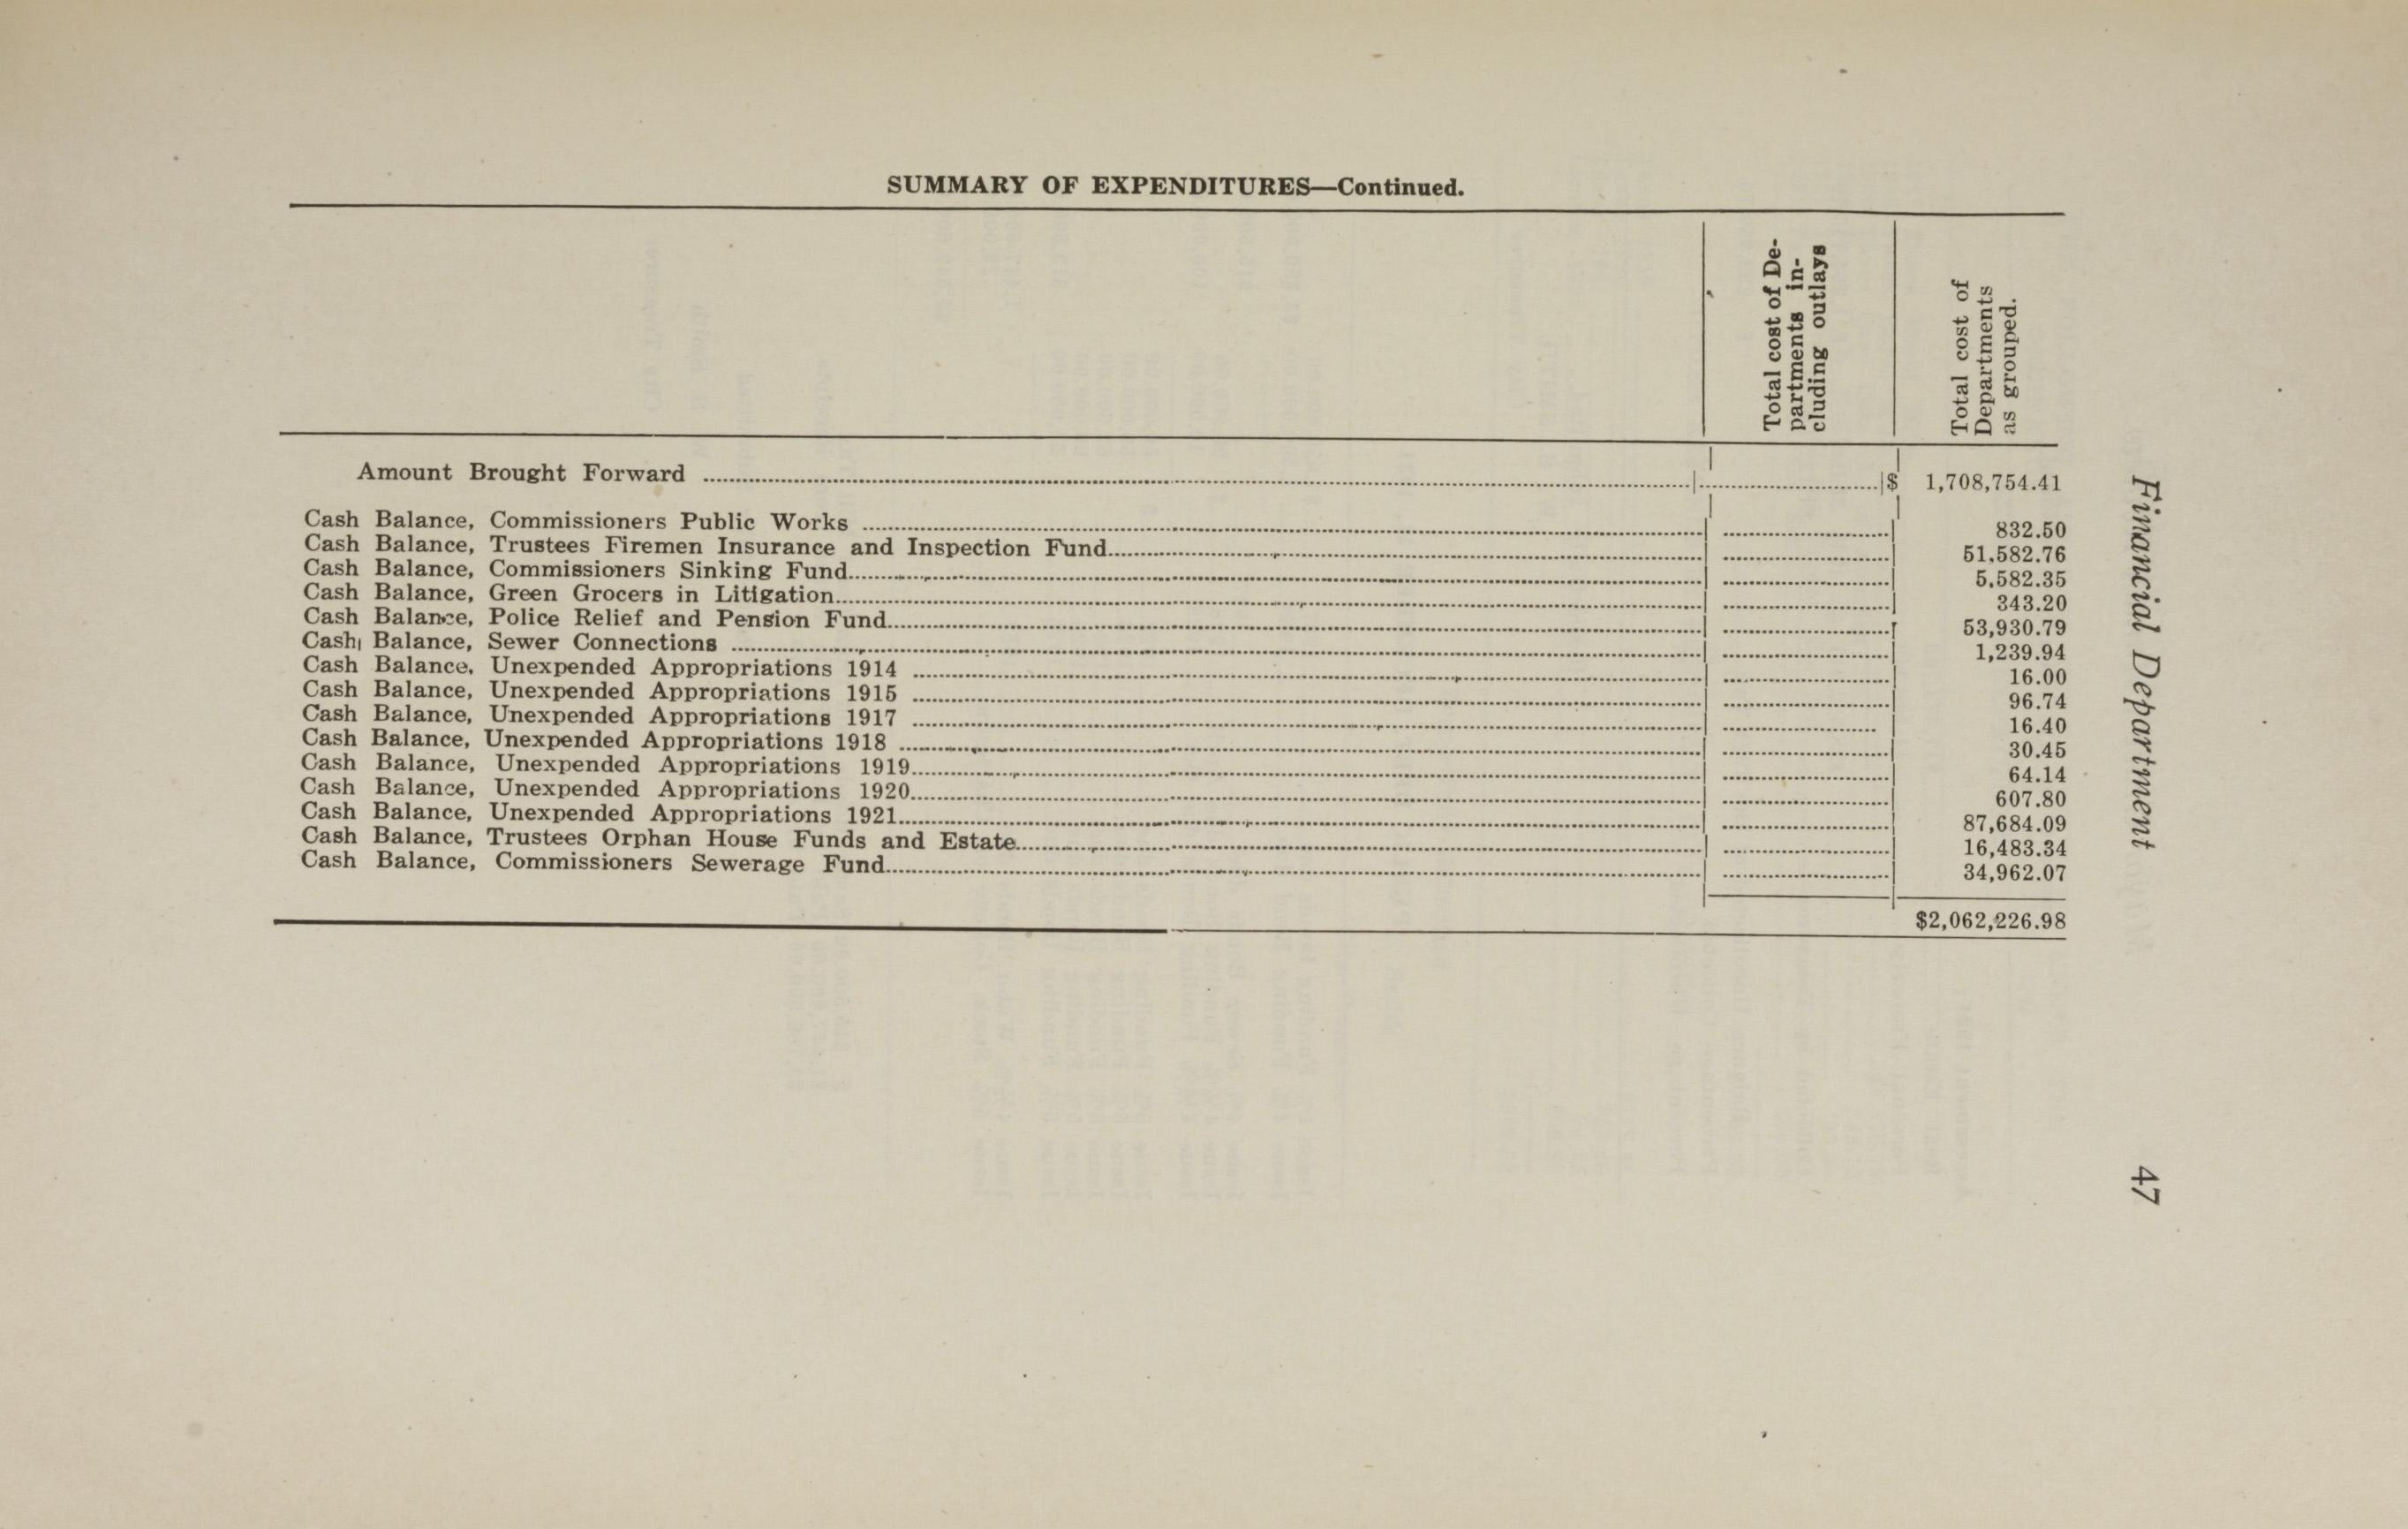 Charleston Yearbook, 1921, page 47